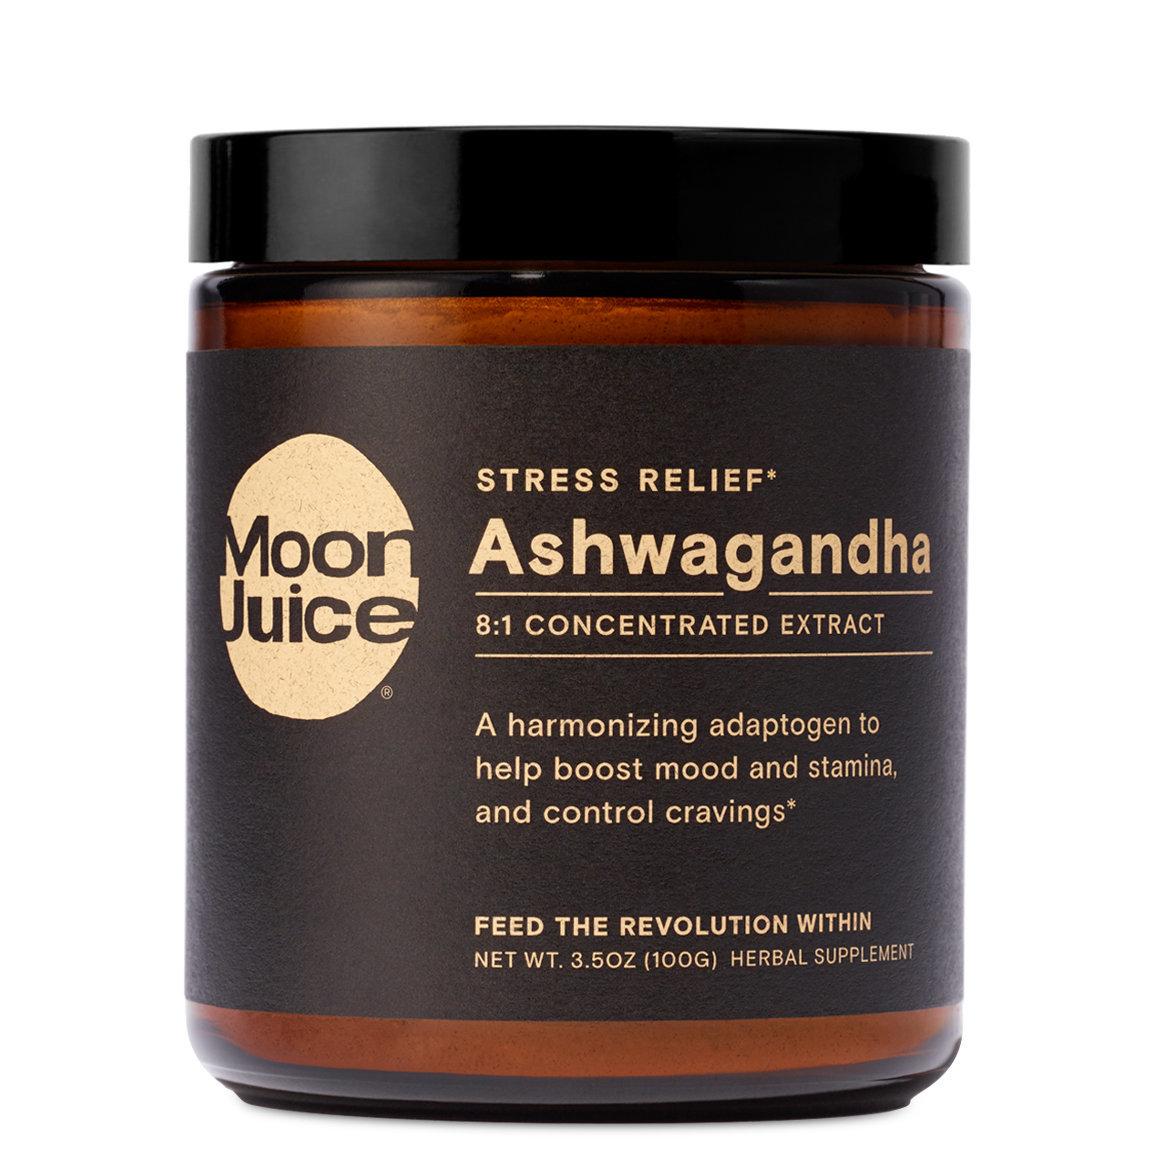 Moon Juice Ashwagandha alternative view 1 - product swatch.